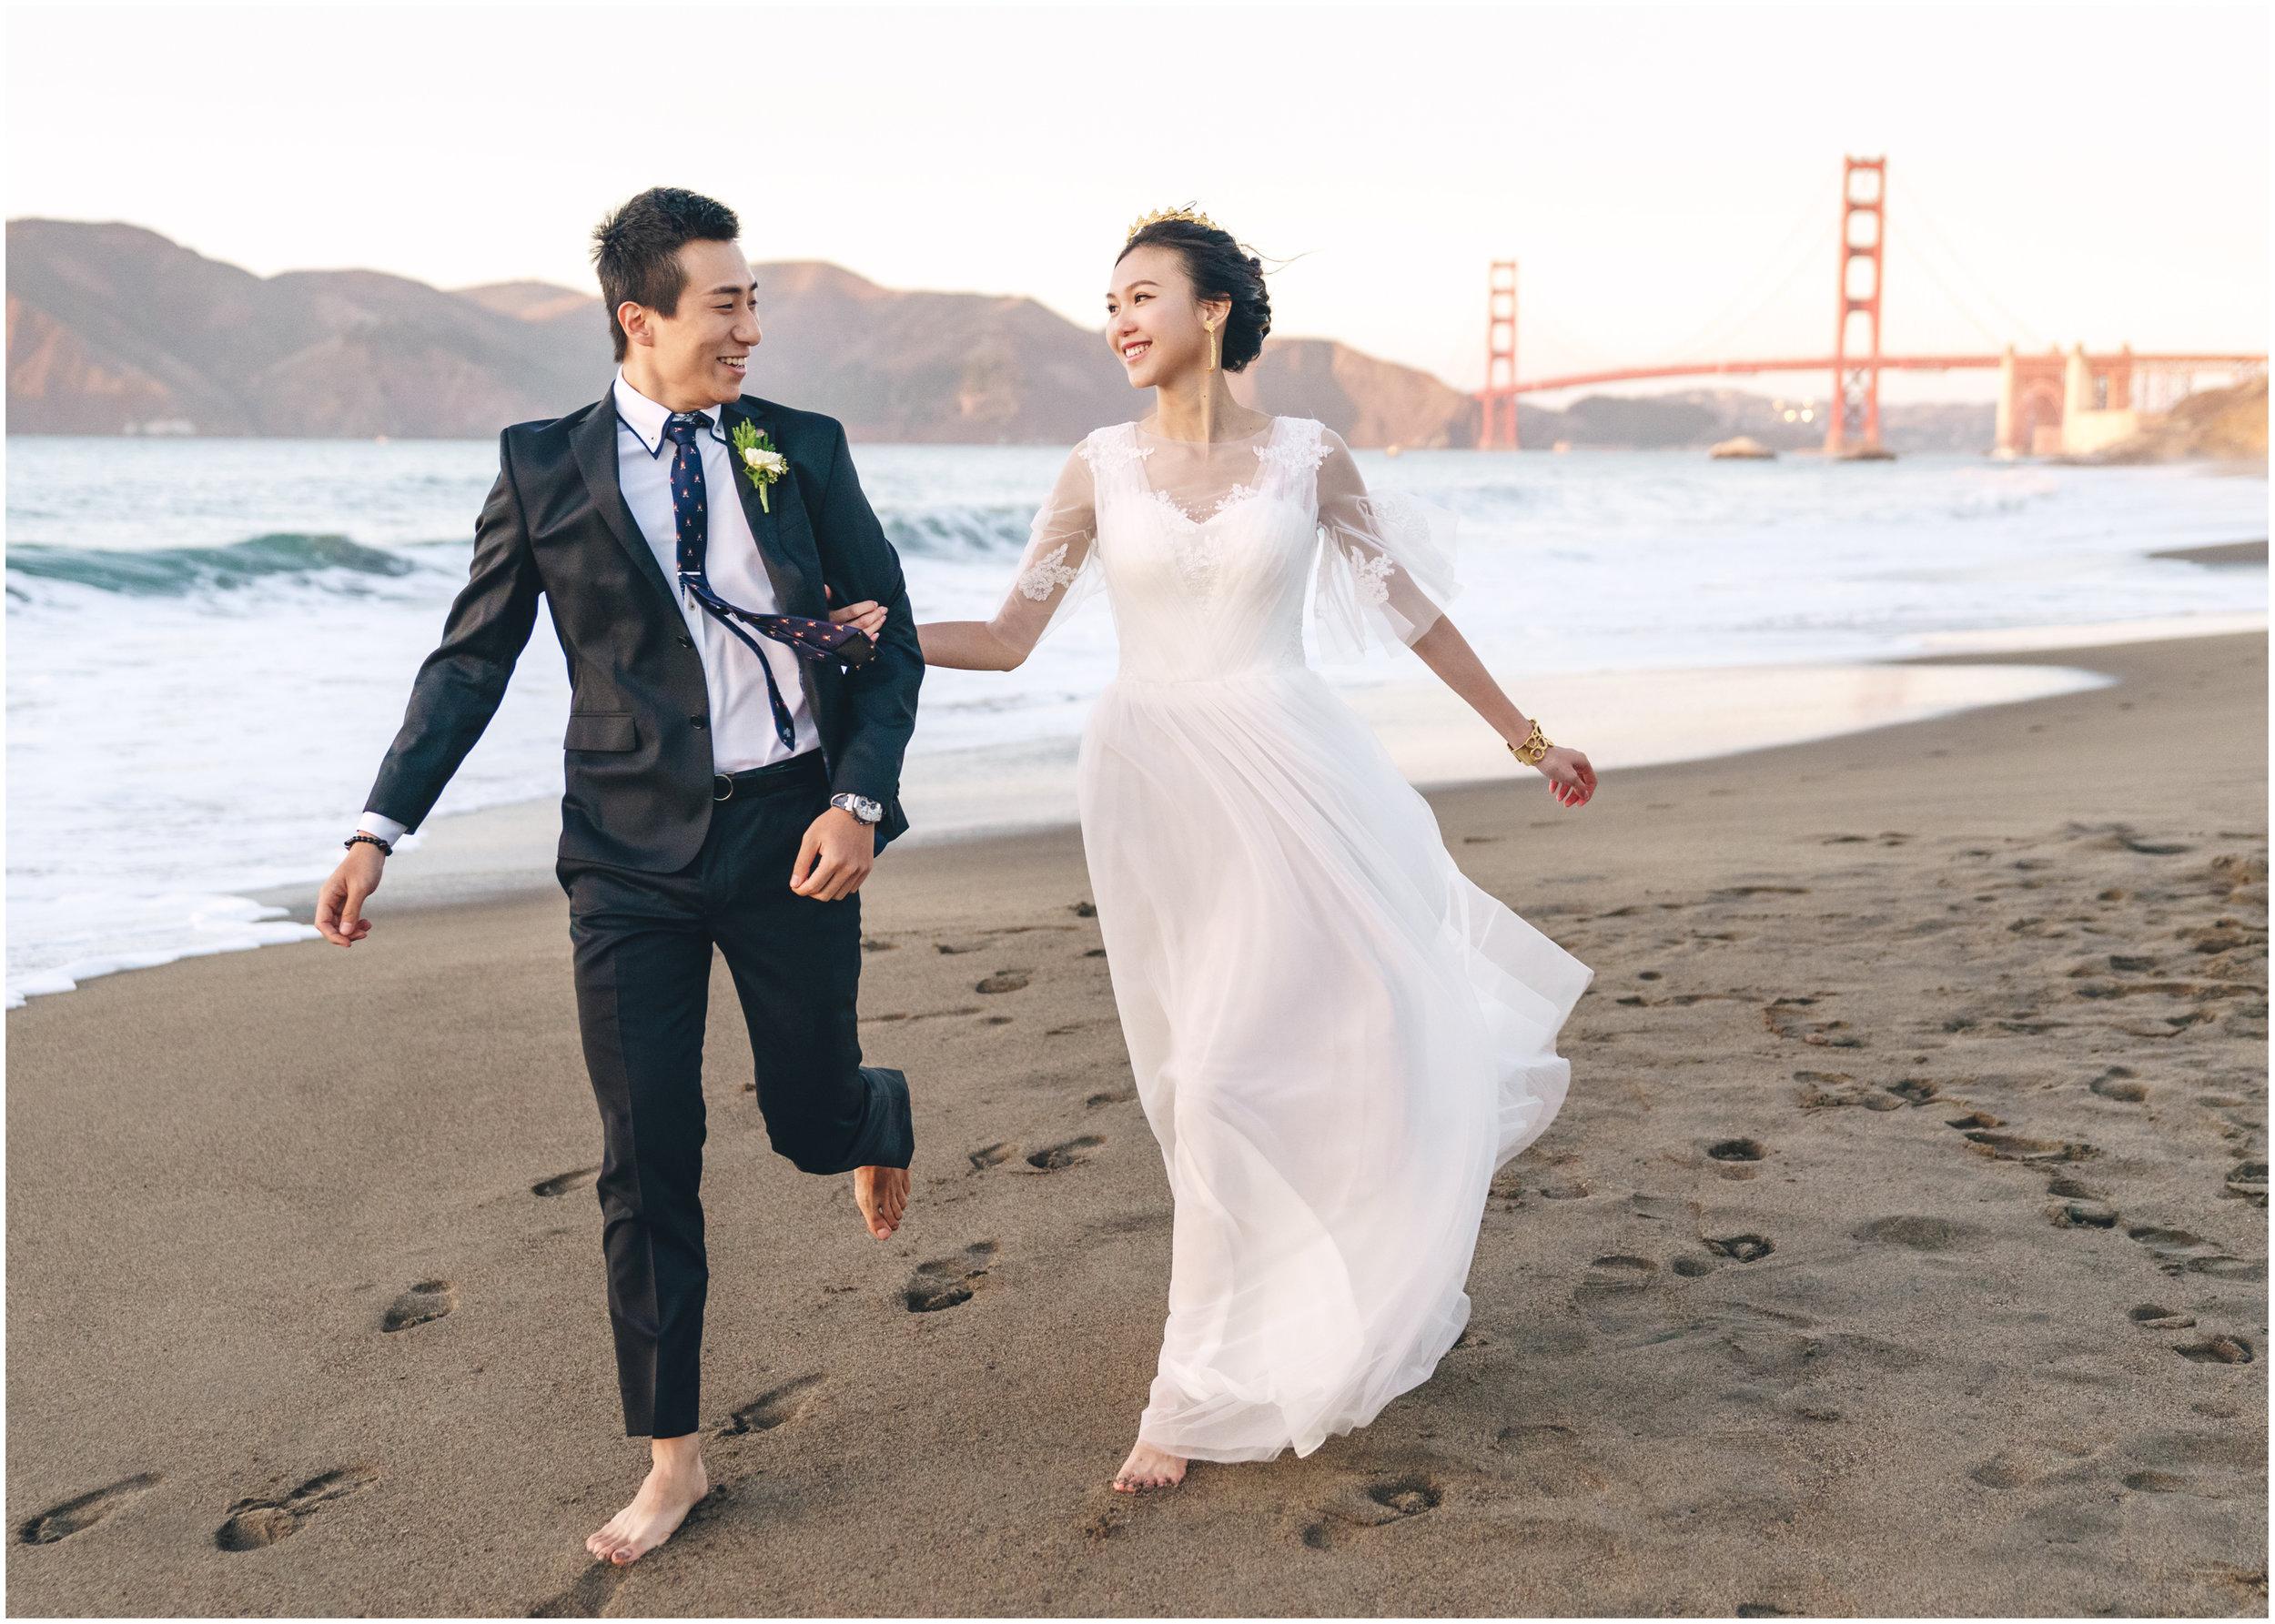 San Francisco Wedding Photographer - Pinnel Photography I&V H-4.jpg